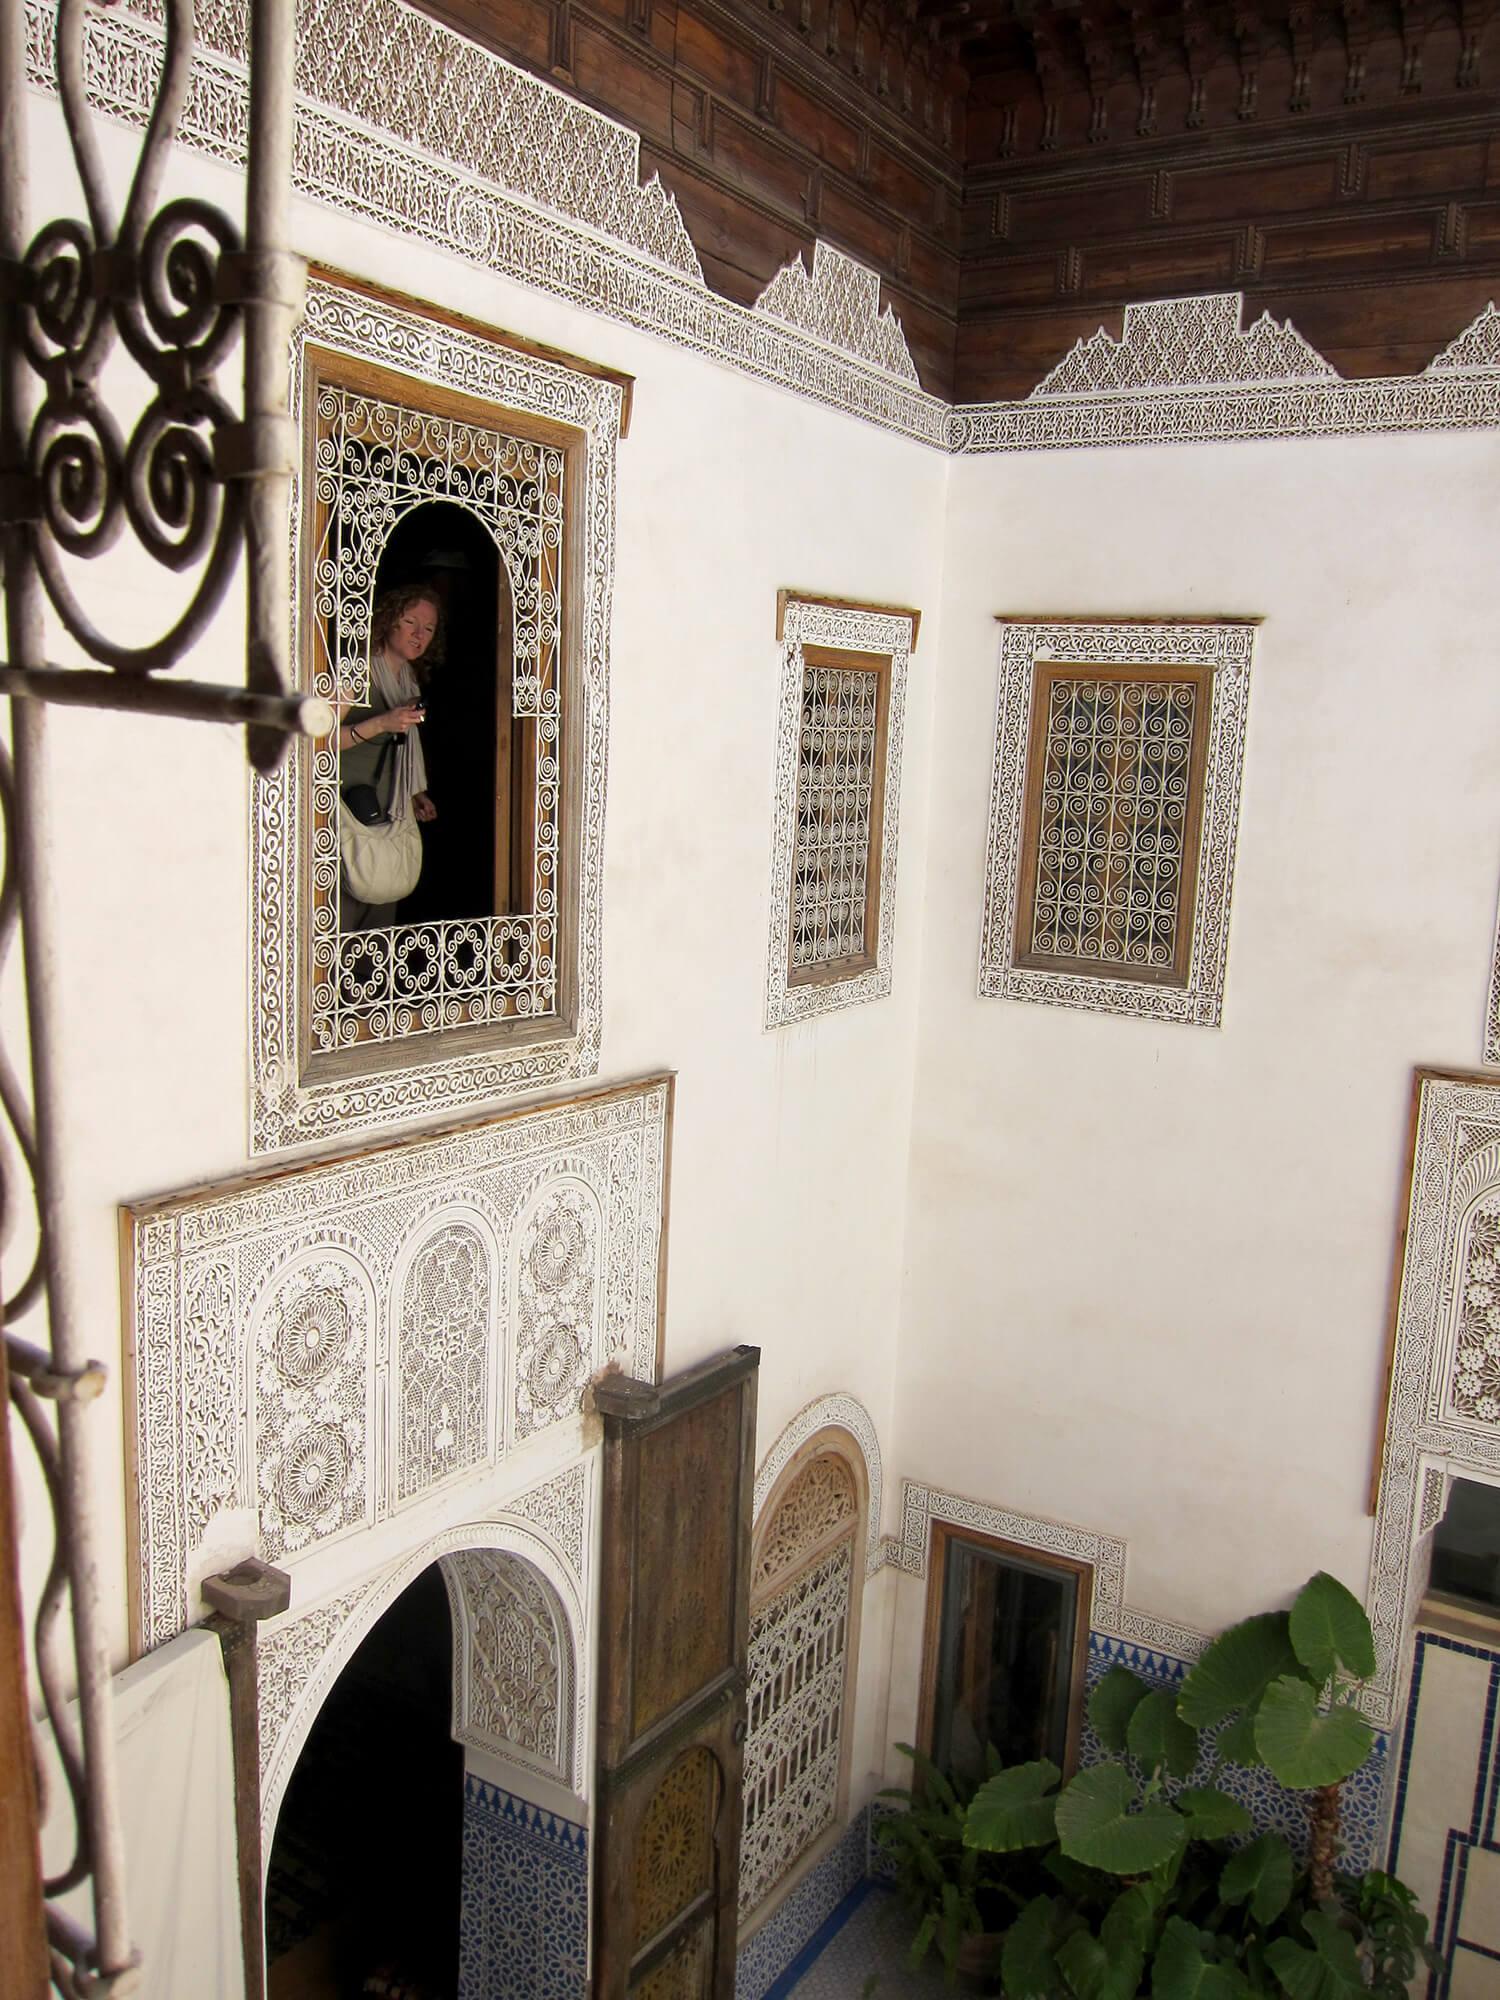 Sahara Desert Tour - Tap into the Magic of Marrakech where Old Meets New - Masion Tiskiwin